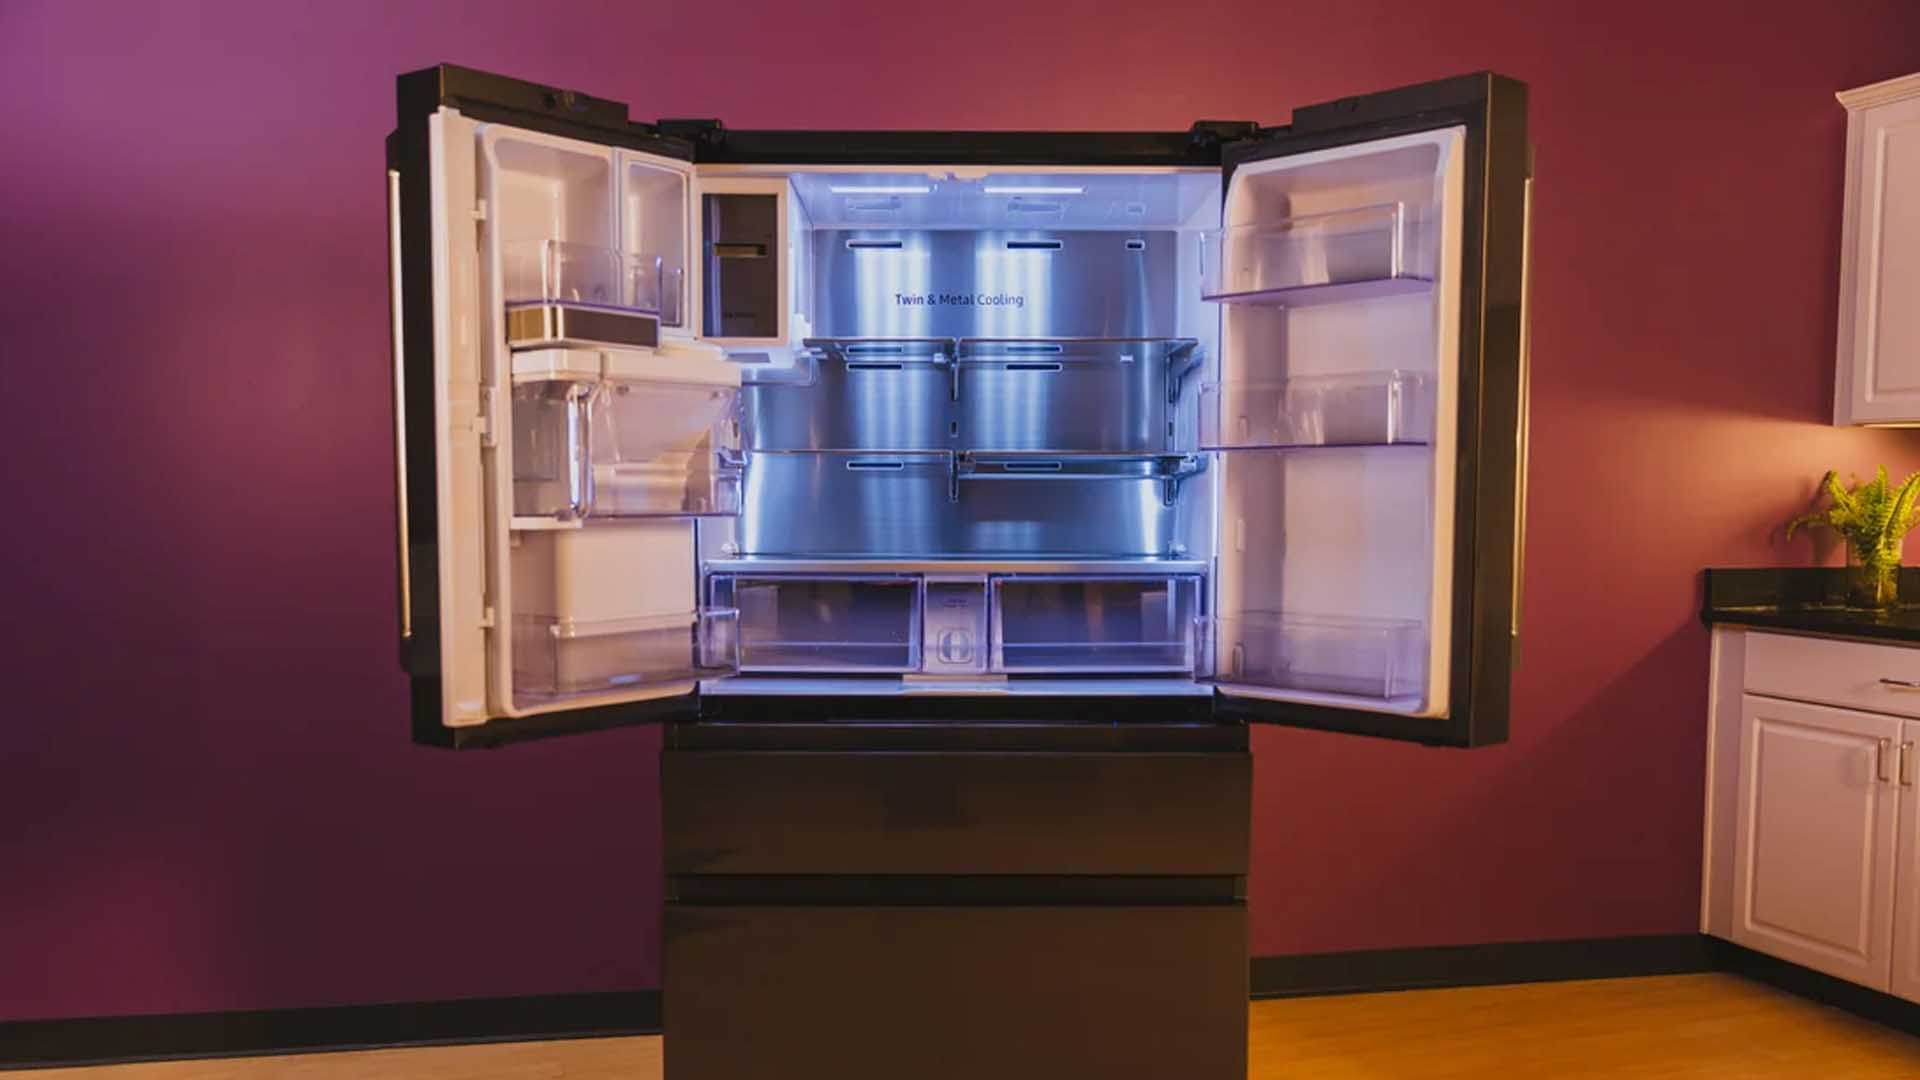 Samsung French Door Refrigerator Repair Service | Samsung Appliance Repairs